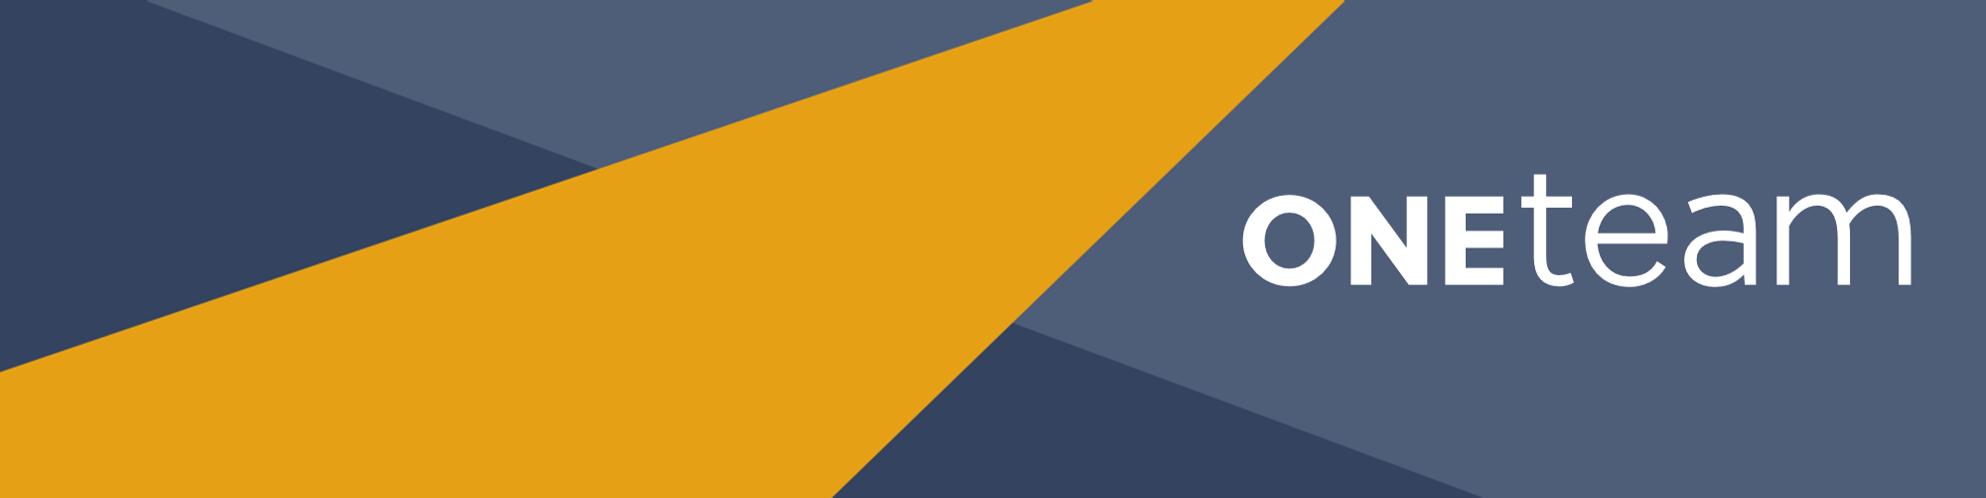 OneTeam blue banner